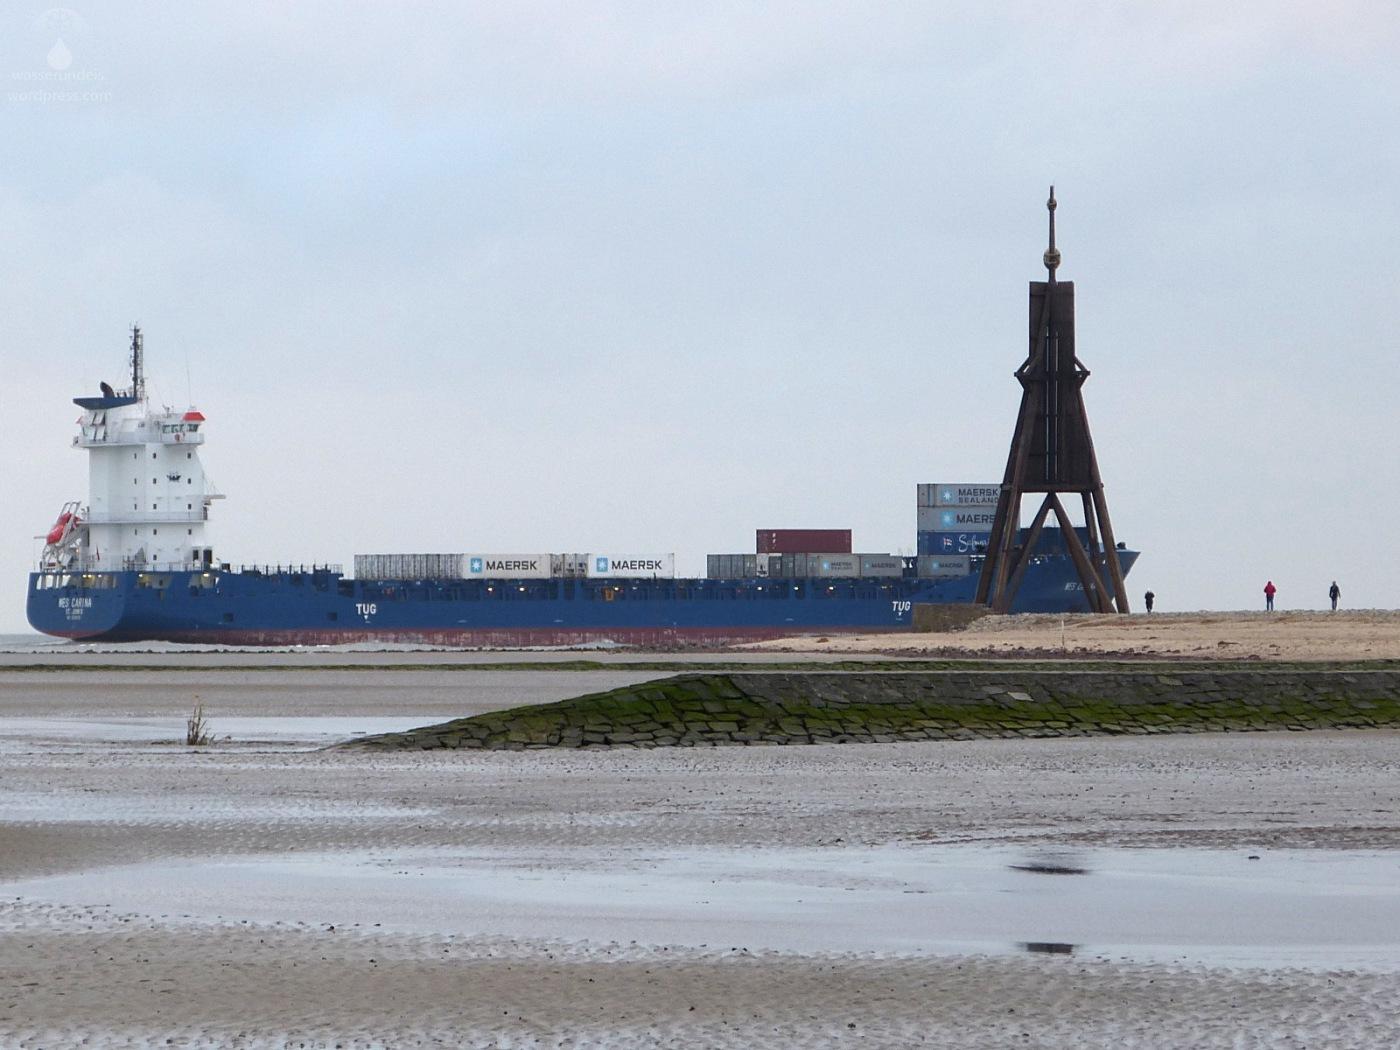 Kugelbake Elbe Döse Schiffe